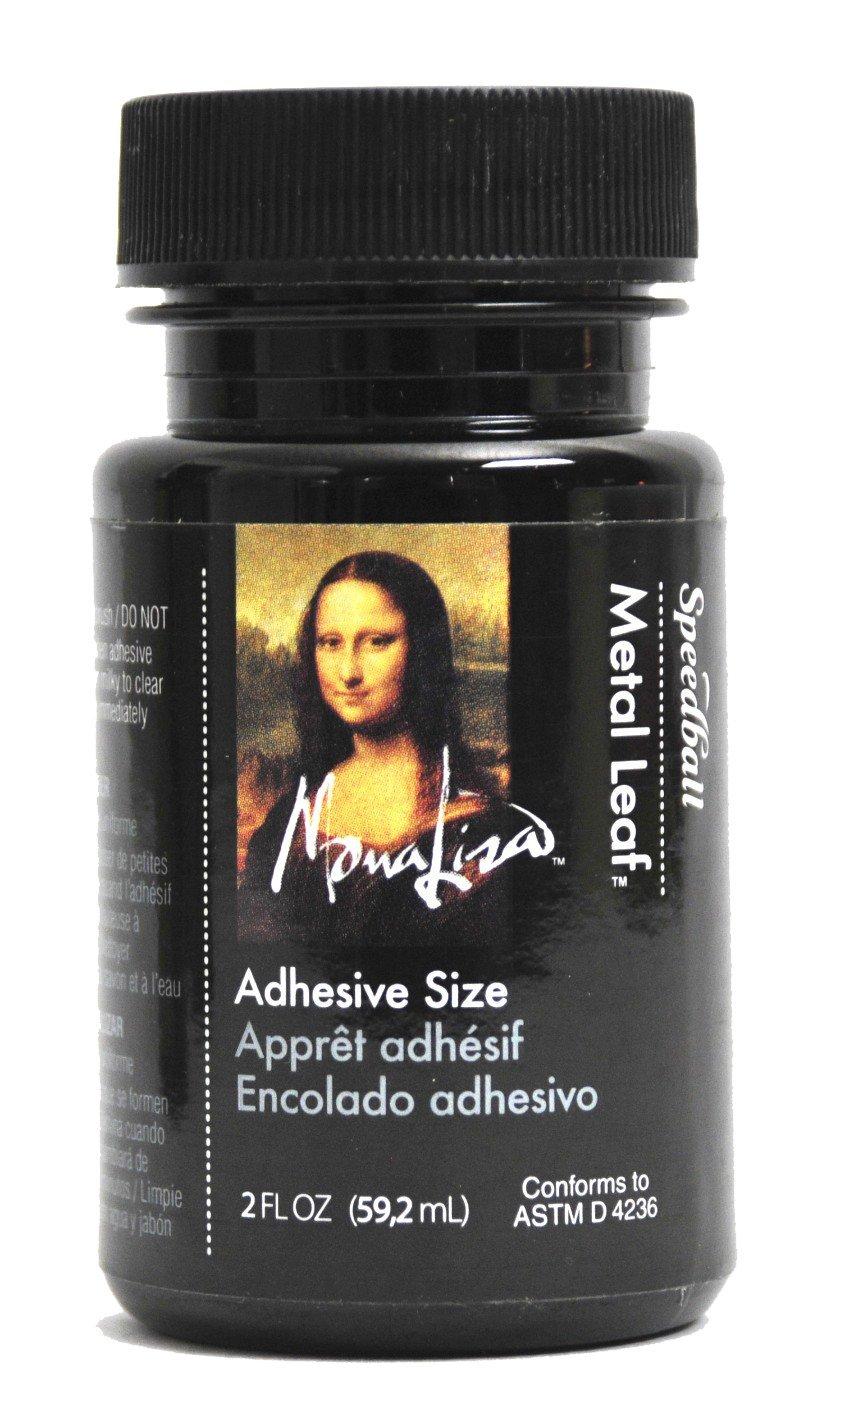 Adhesive Size